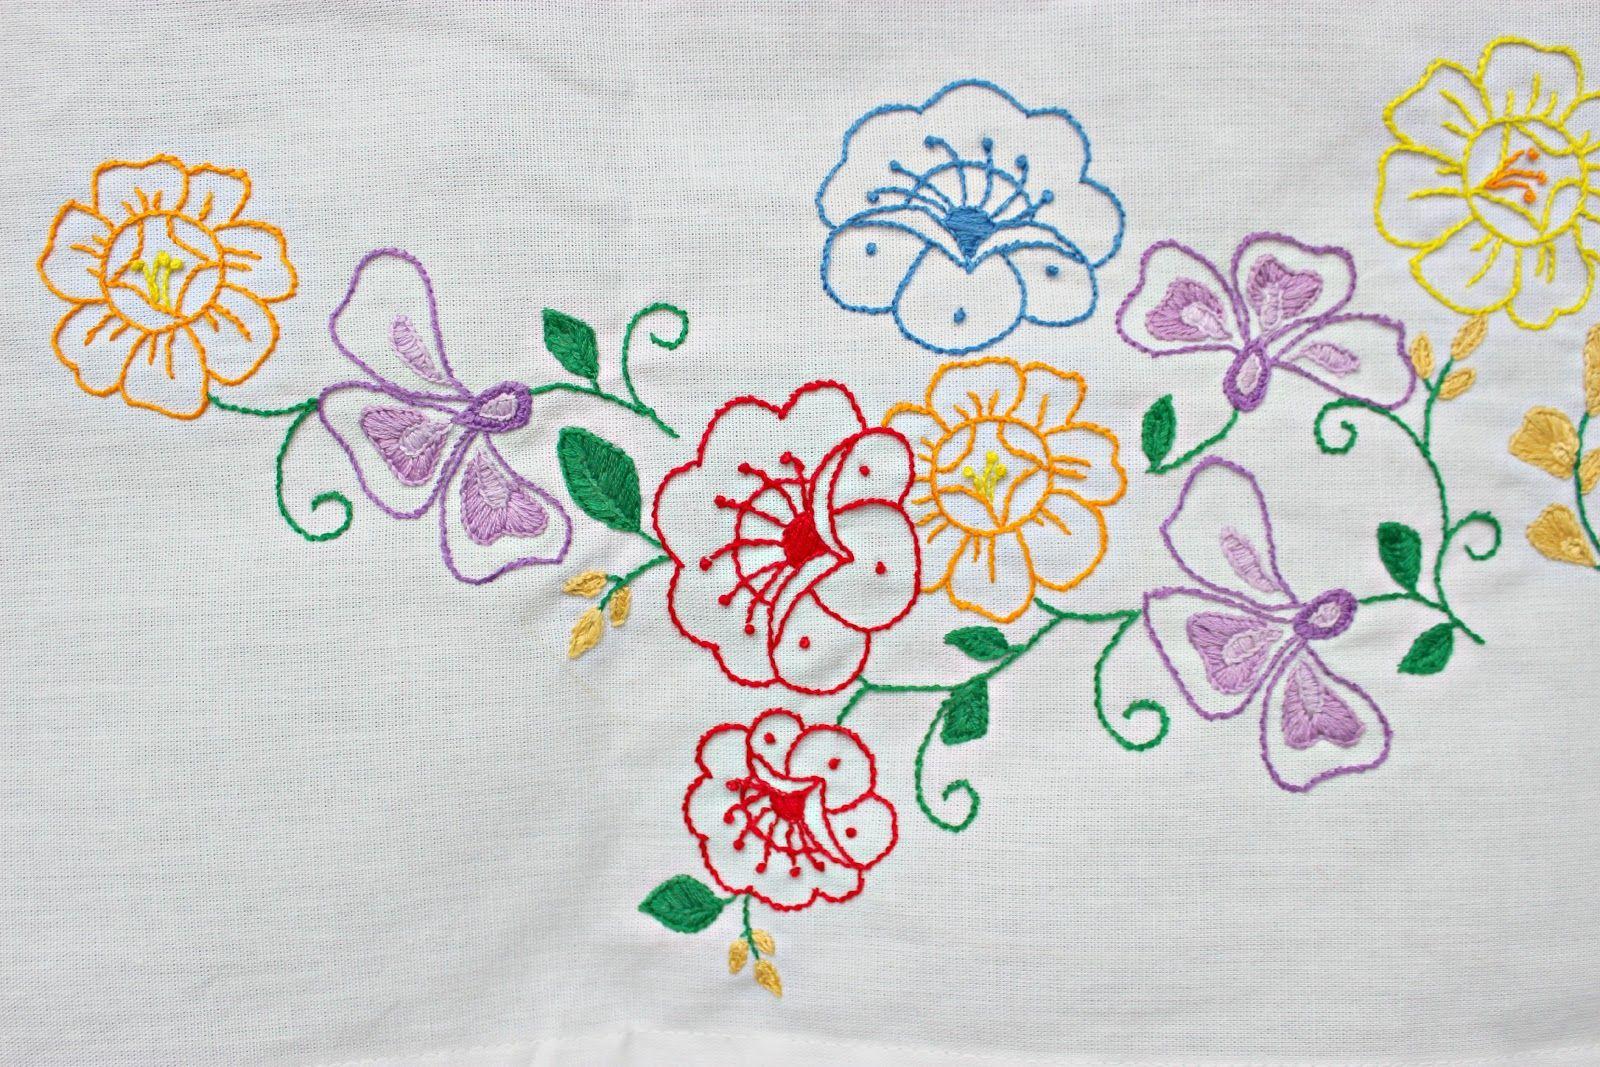 hand embroidery designs for bed sheets - Hľadať Googlom   Designs ...